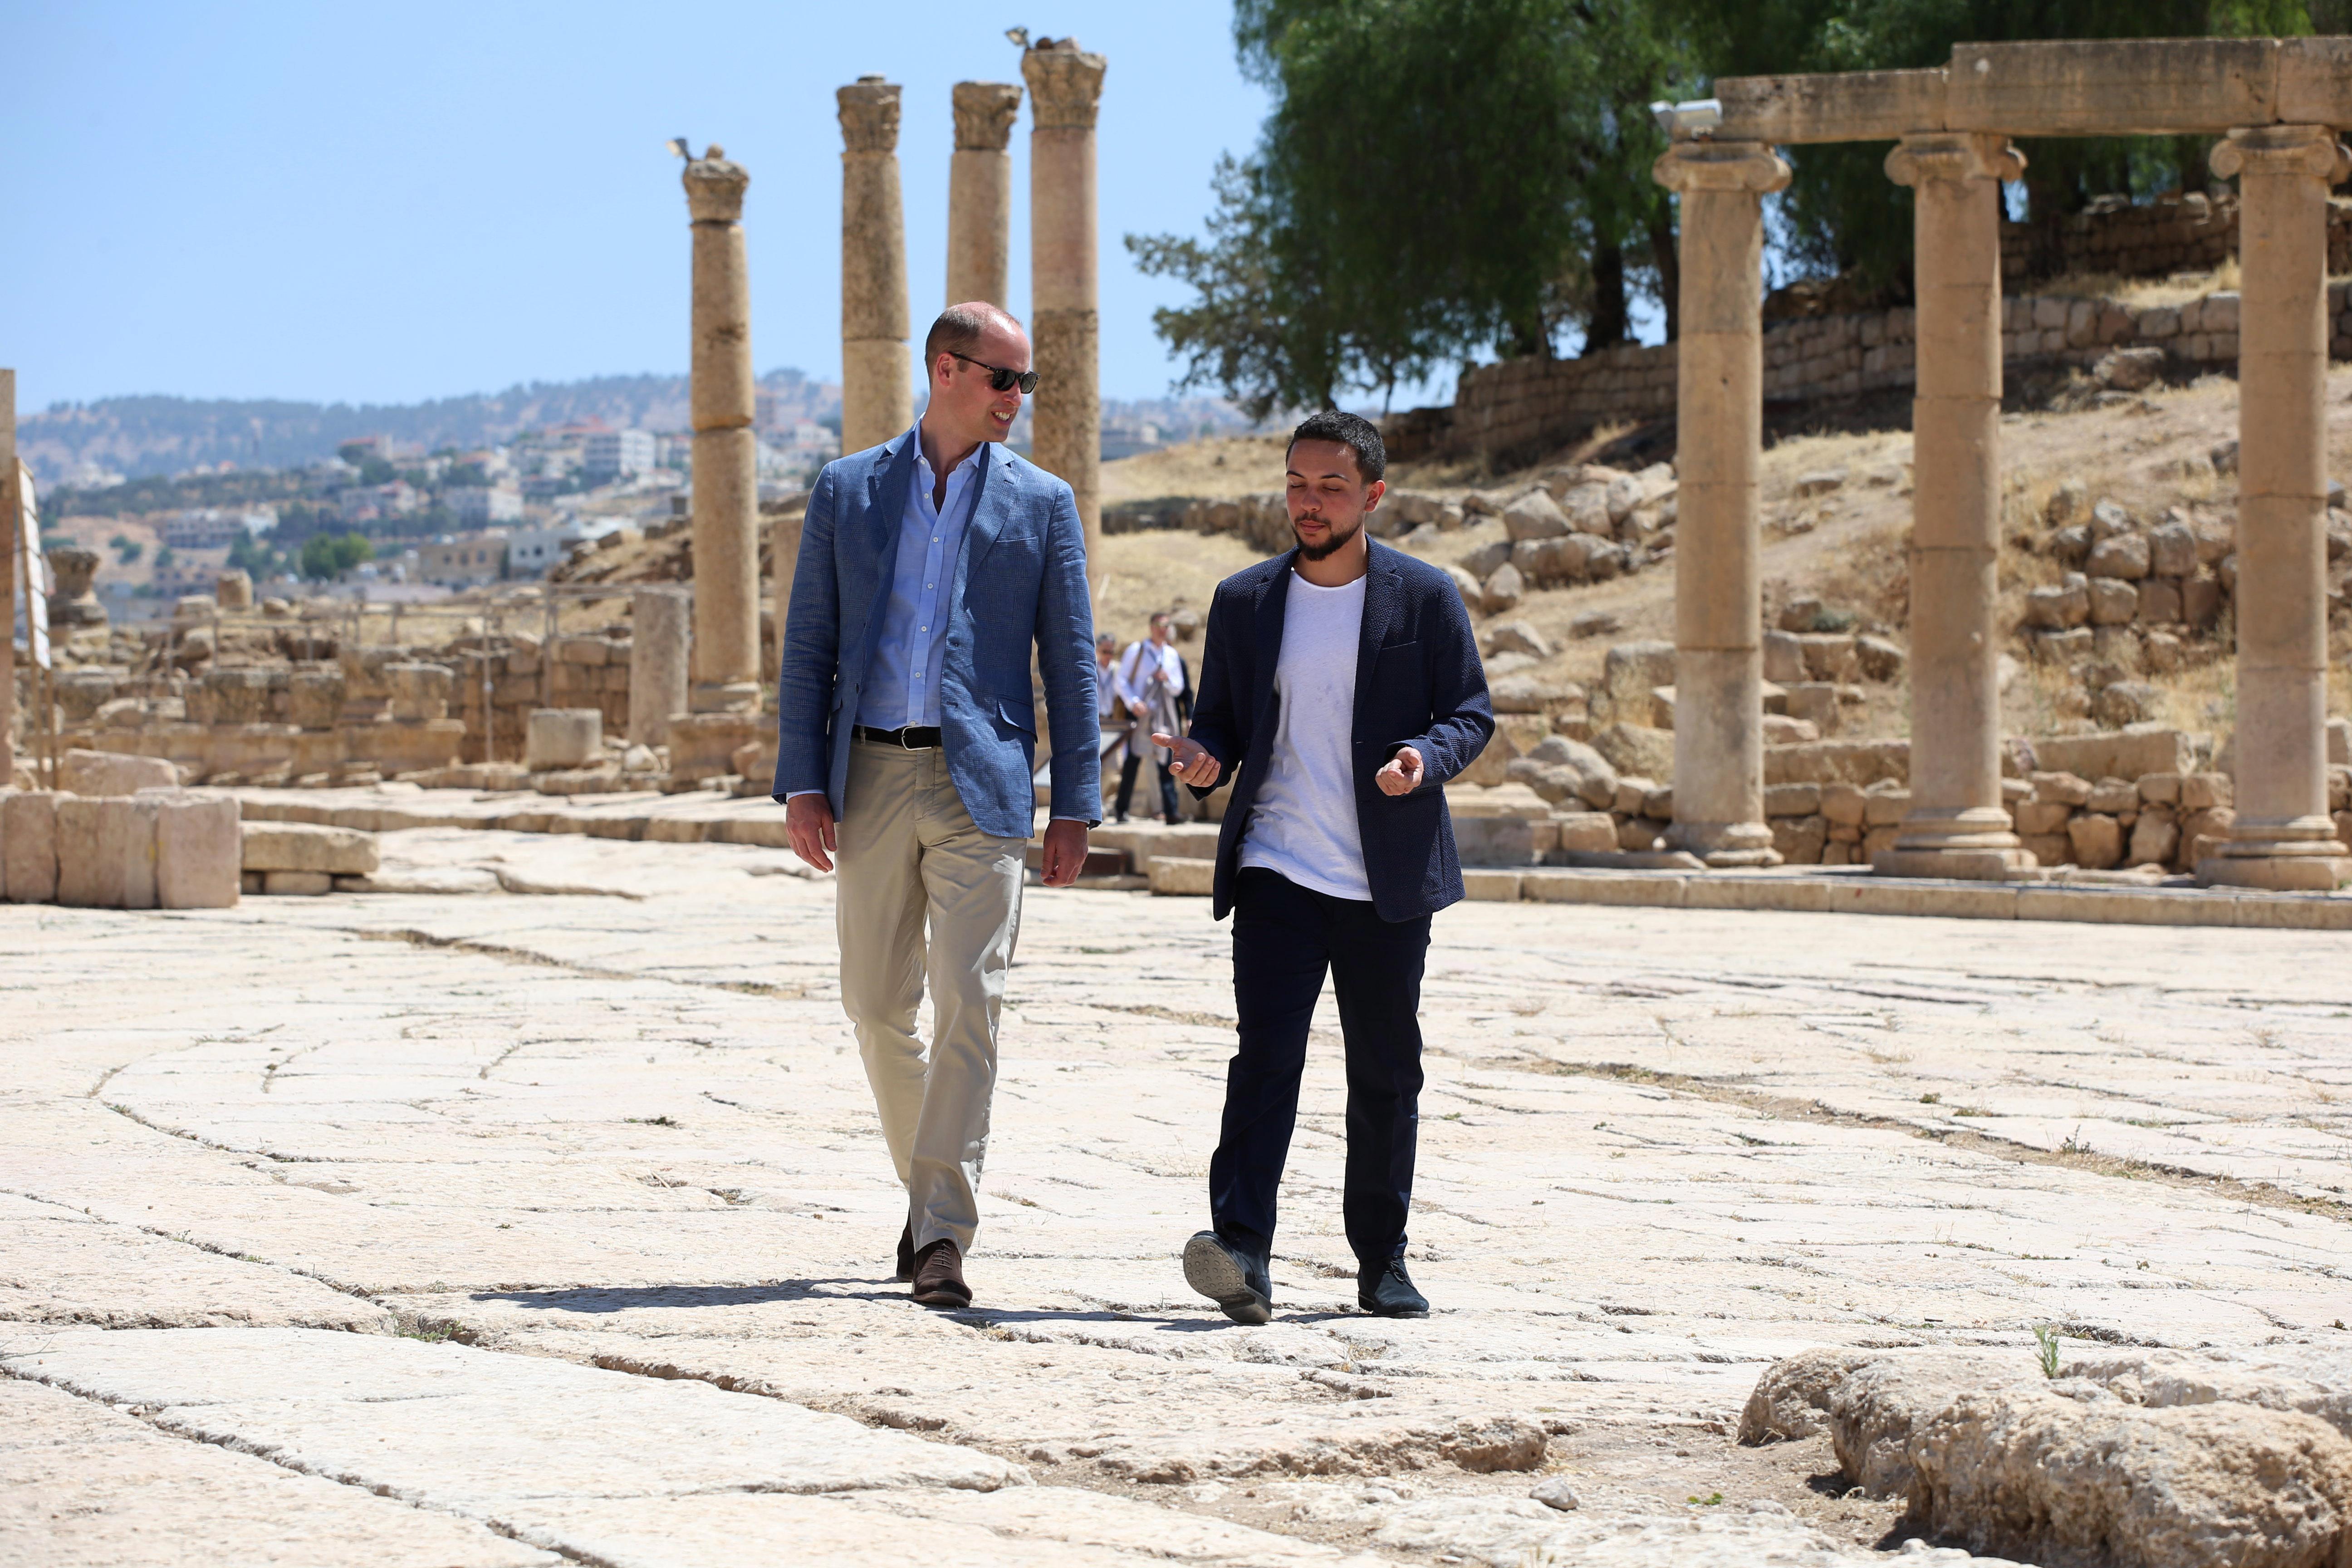 AMMAN, JORDAN - JUNE 25: Prince William, Duke of Cambridge and Crown Prince Hussein of Jordan visit the Jerash archaeological site on June 25, 2018 in Amman, Jordan.